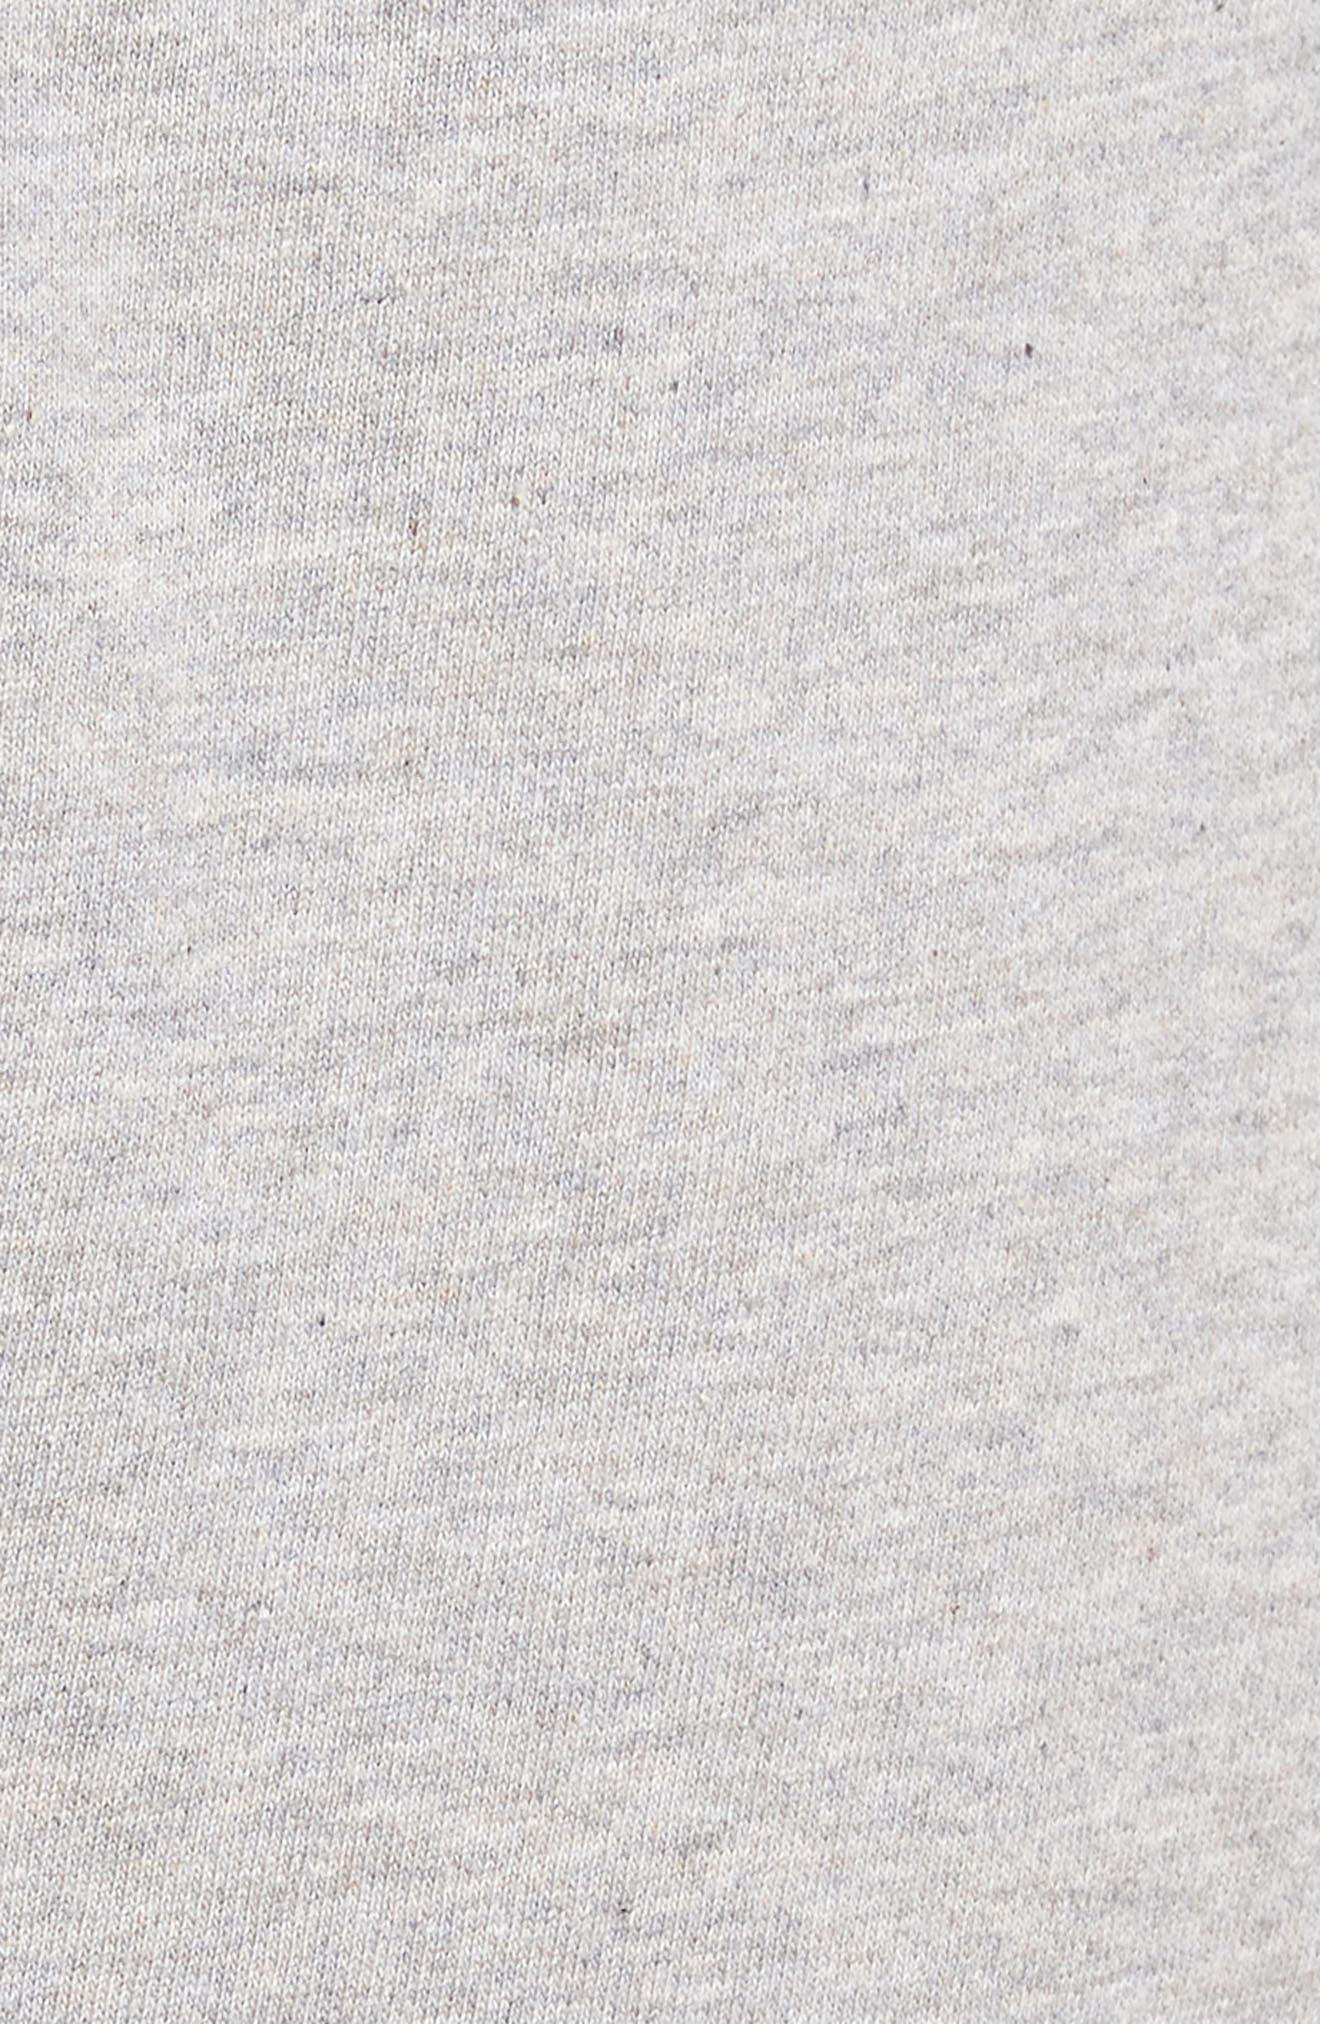 Sweat Shorts,                             Alternate thumbnail 5, color,                             038